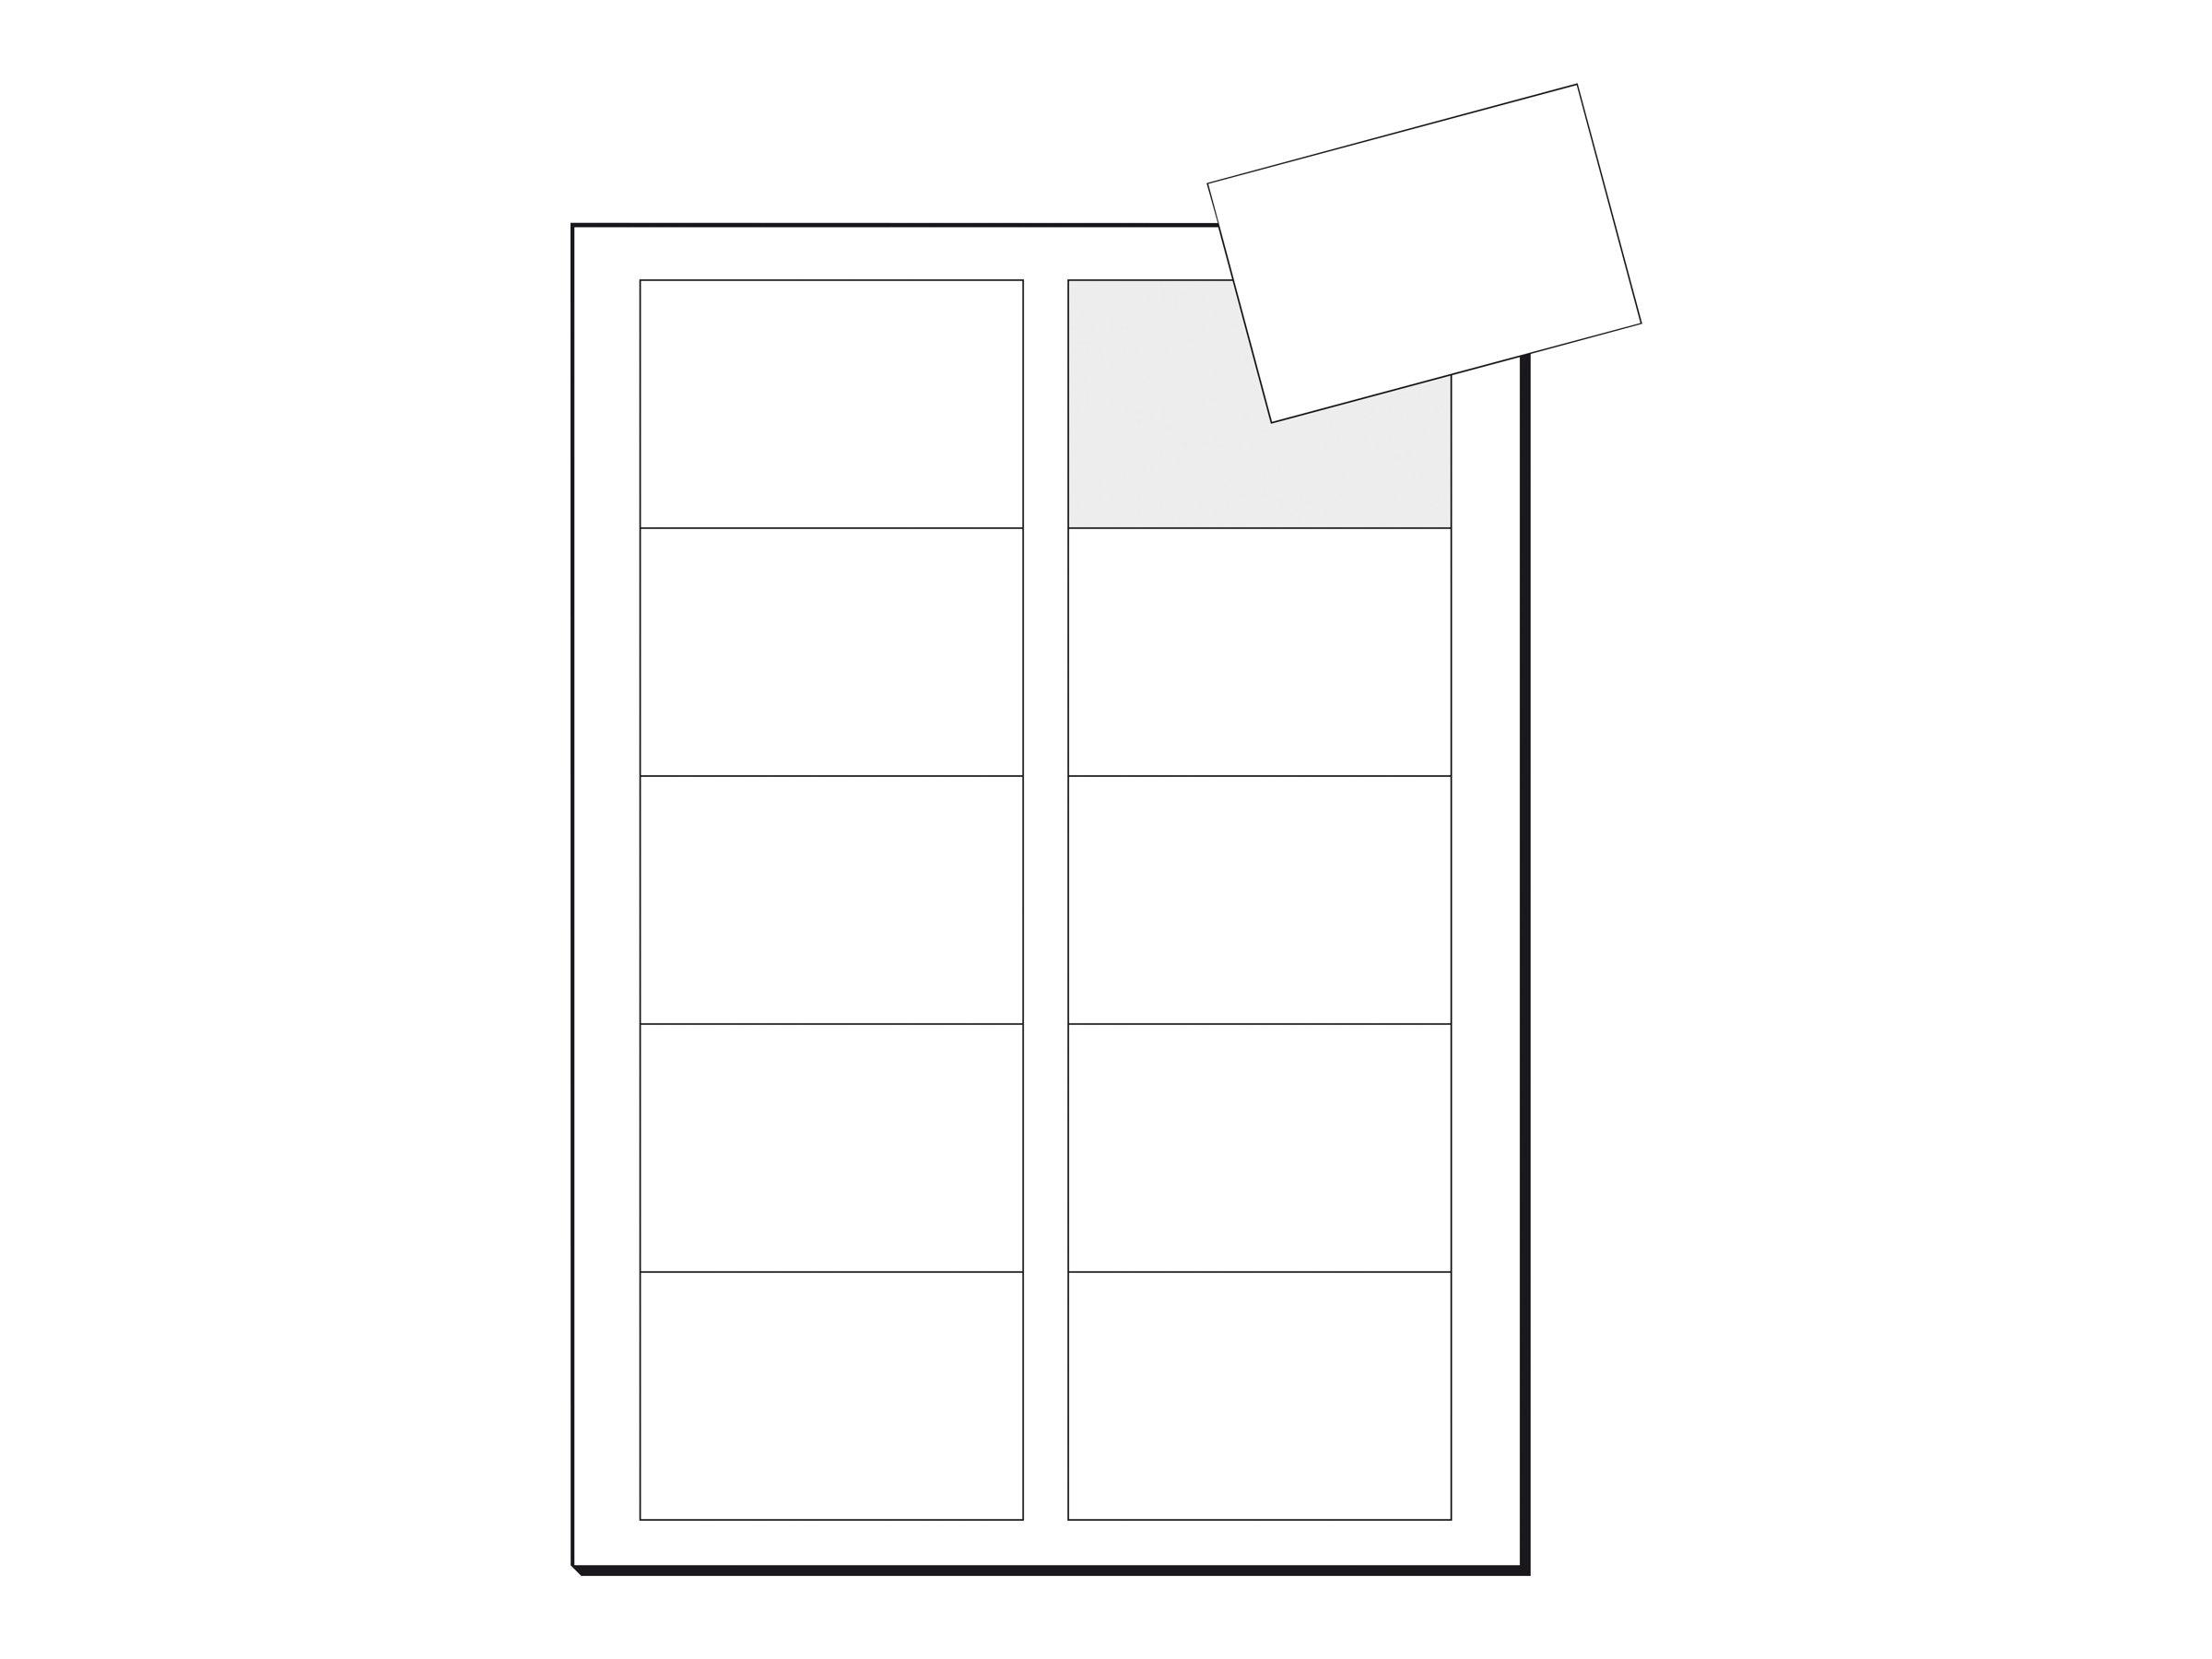 Sigel Business Card 3C LP790 - Hochweiß - 85 x 55 mm - 190 g/m² - 100 Karte(n) (10 Bogen x 10)